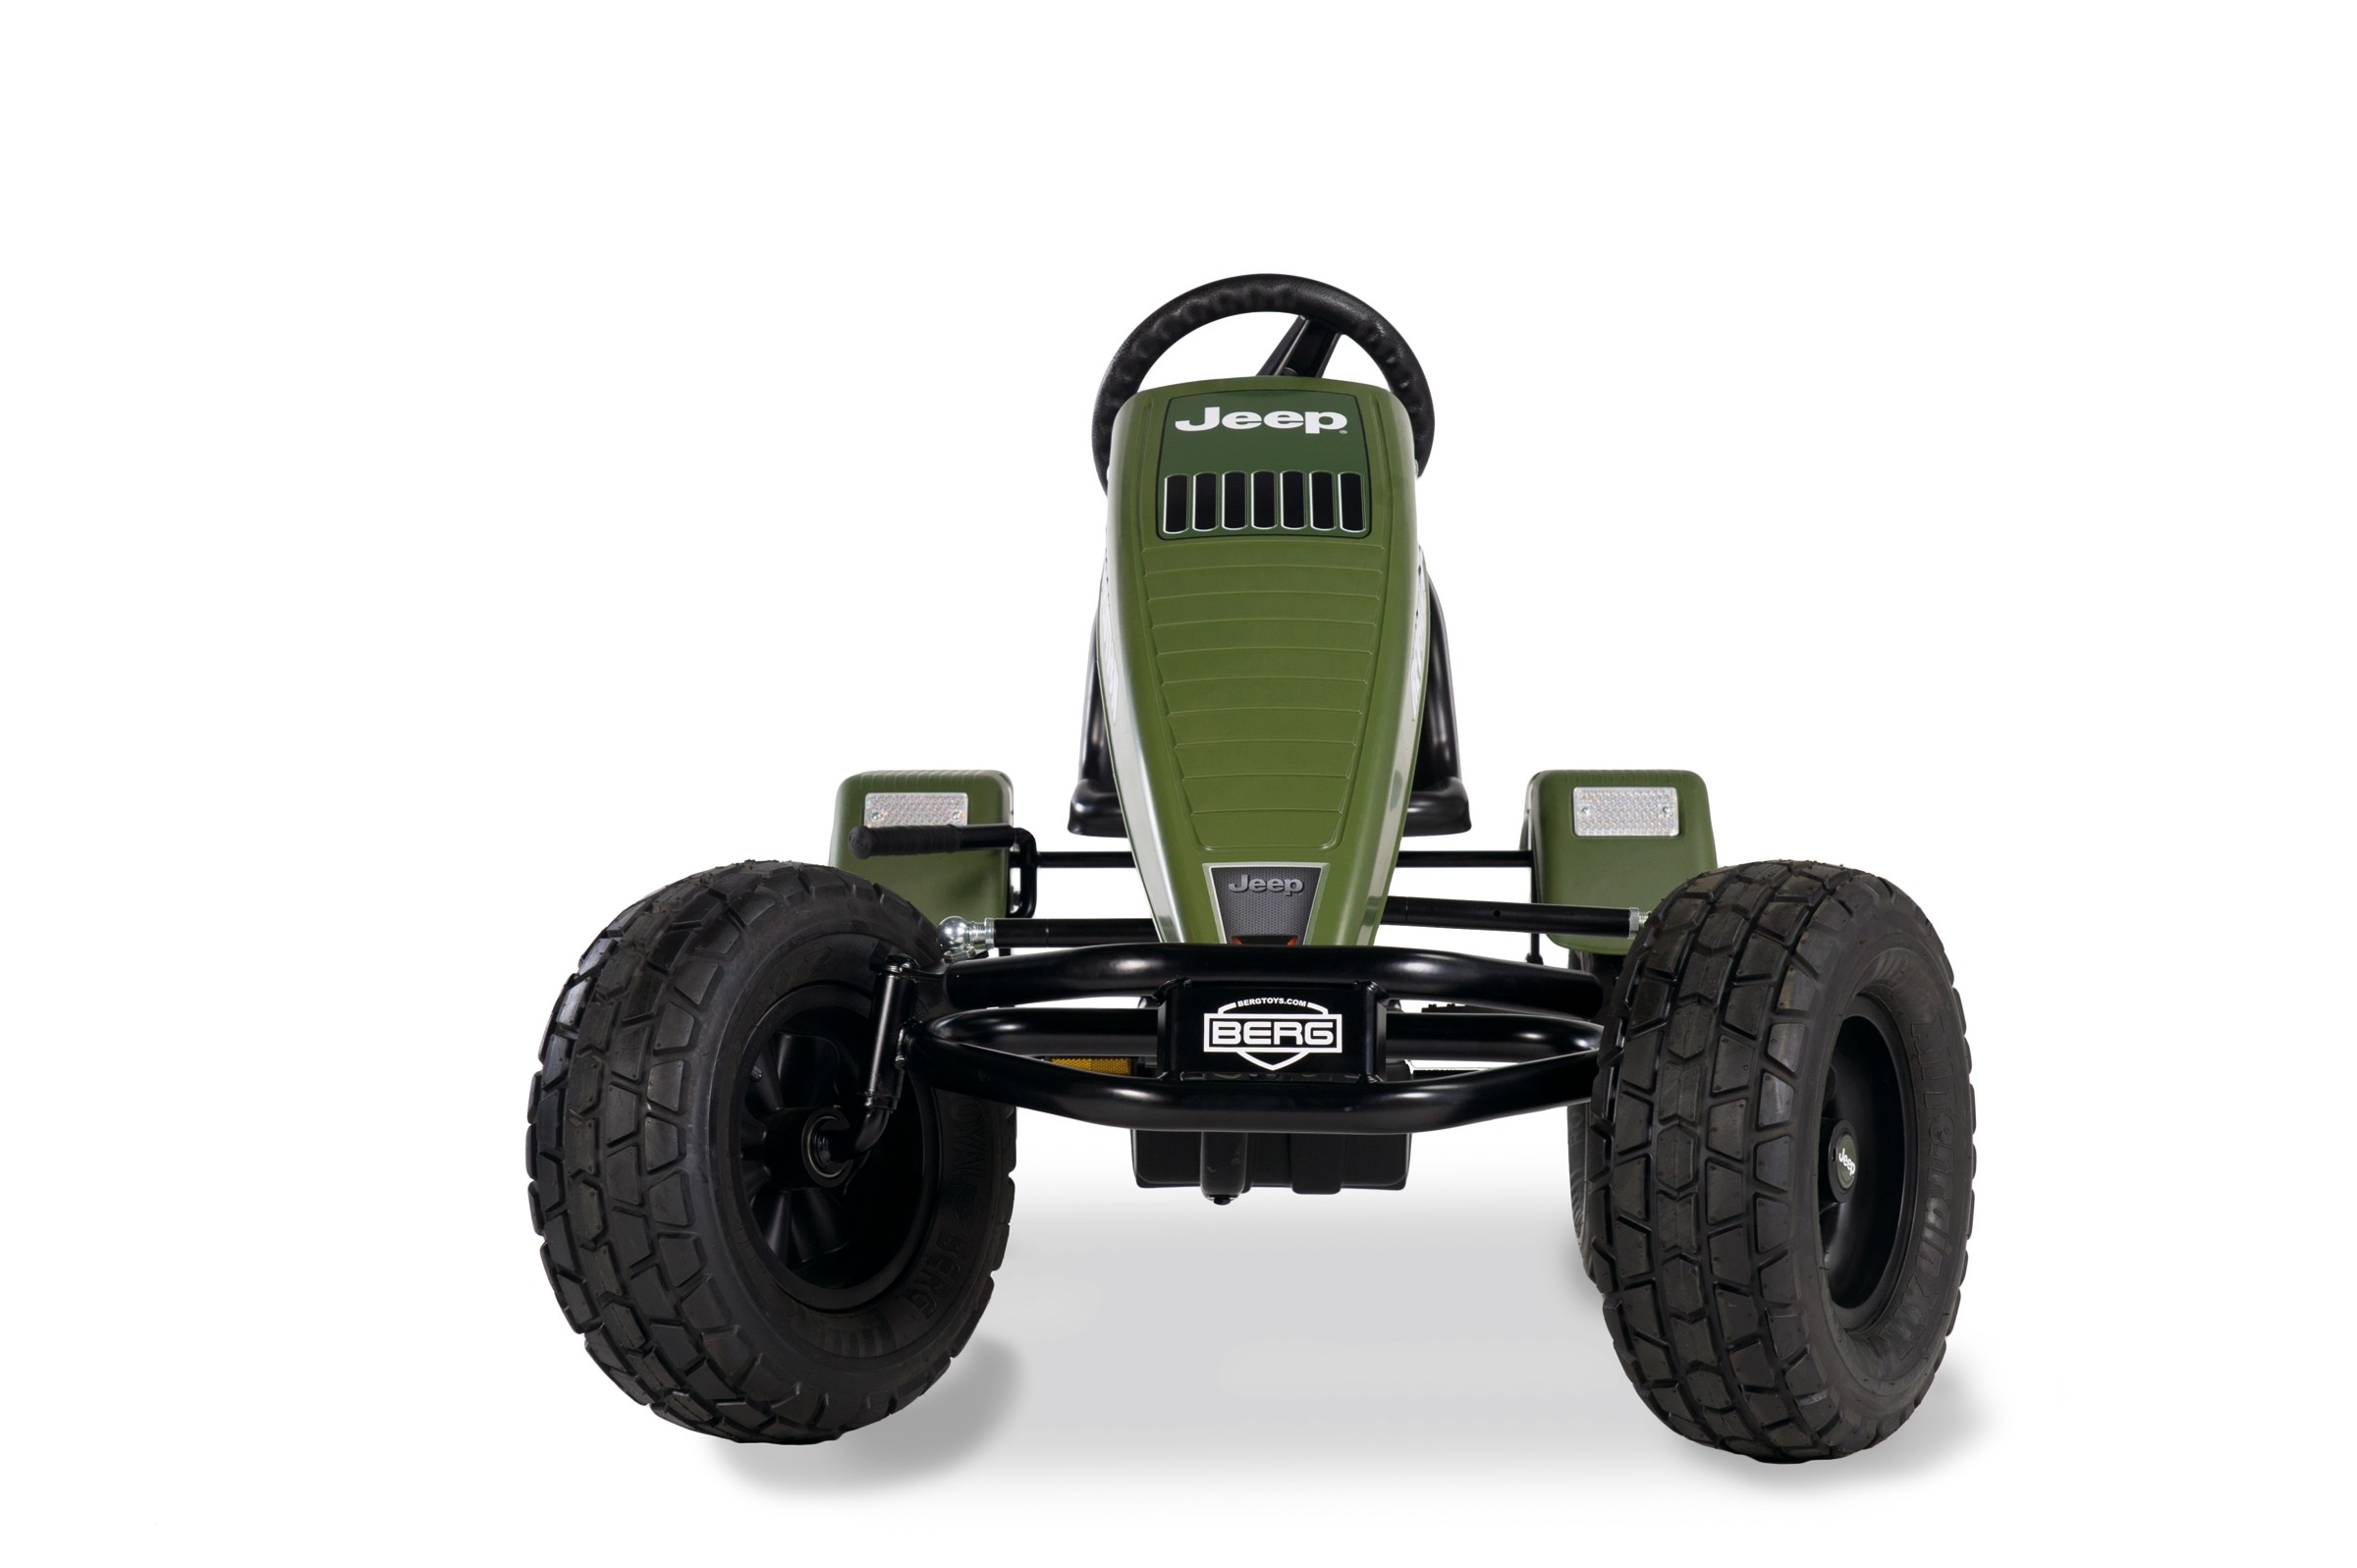 gokart pedal gokart jeep revolution bfr 3 berg toys. Black Bedroom Furniture Sets. Home Design Ideas